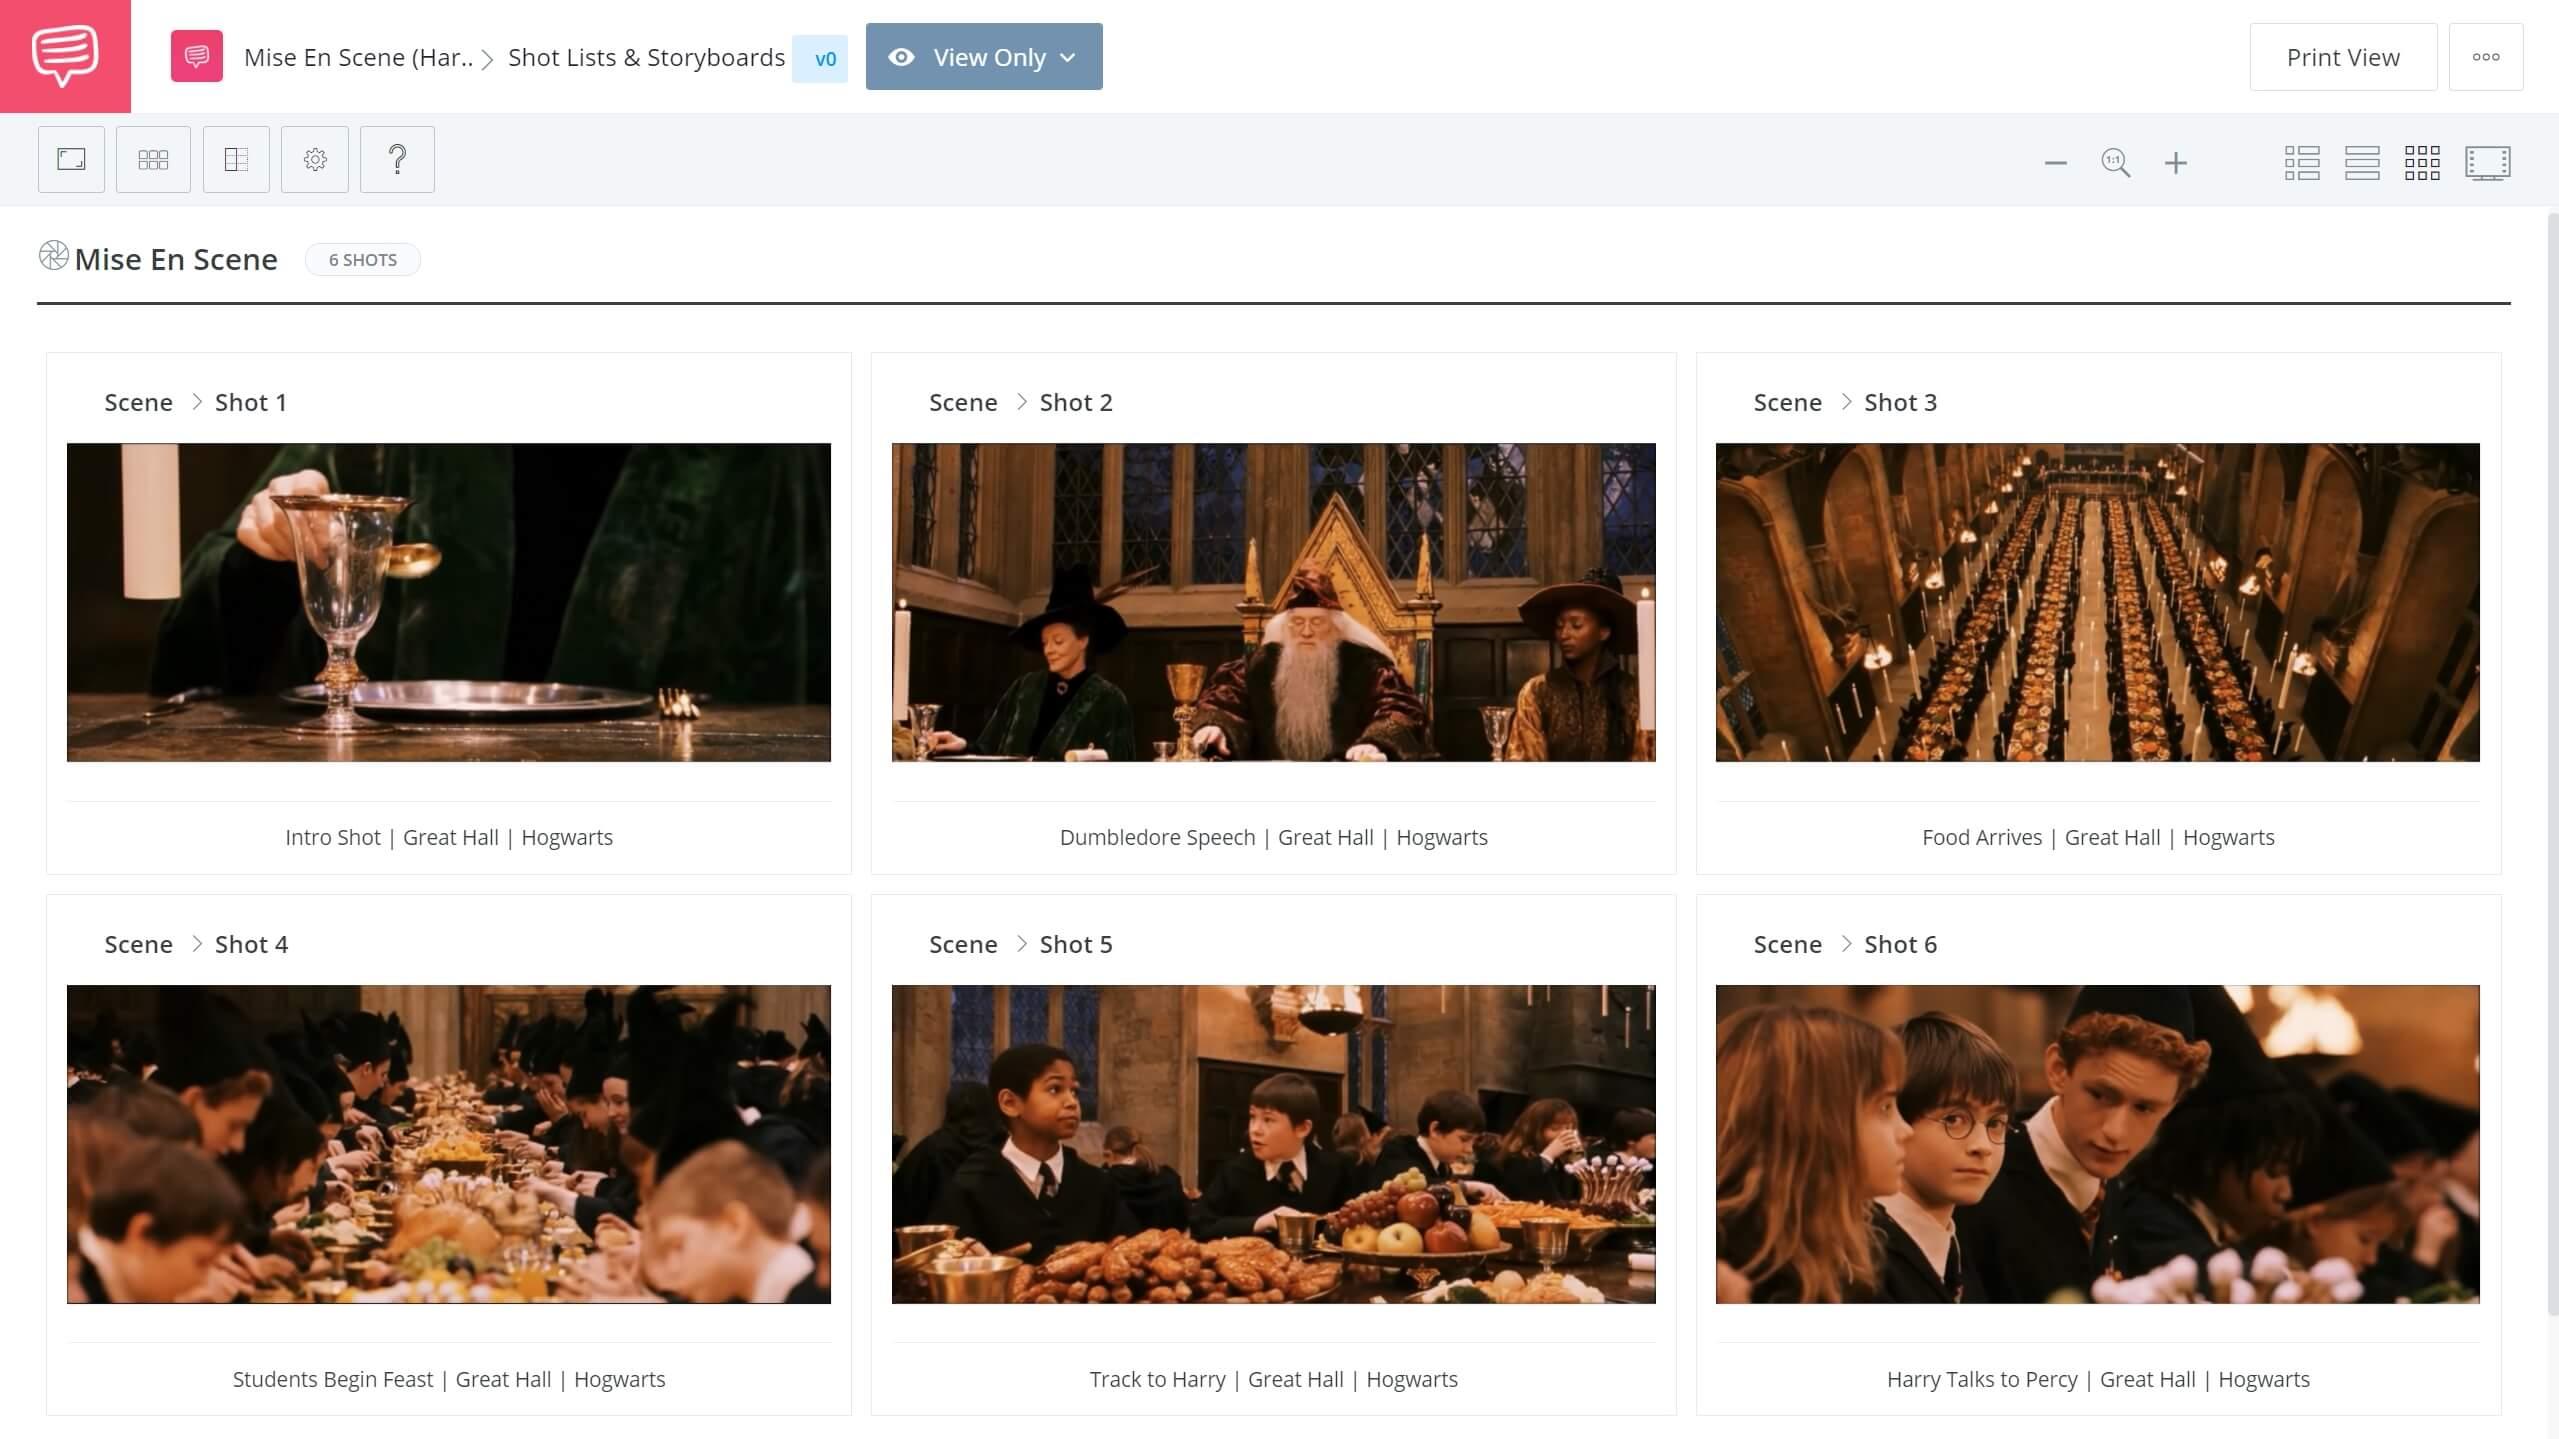 Mise-en-scene-Harry-Potter-storyboard - StudioBinder Screenwriting Software